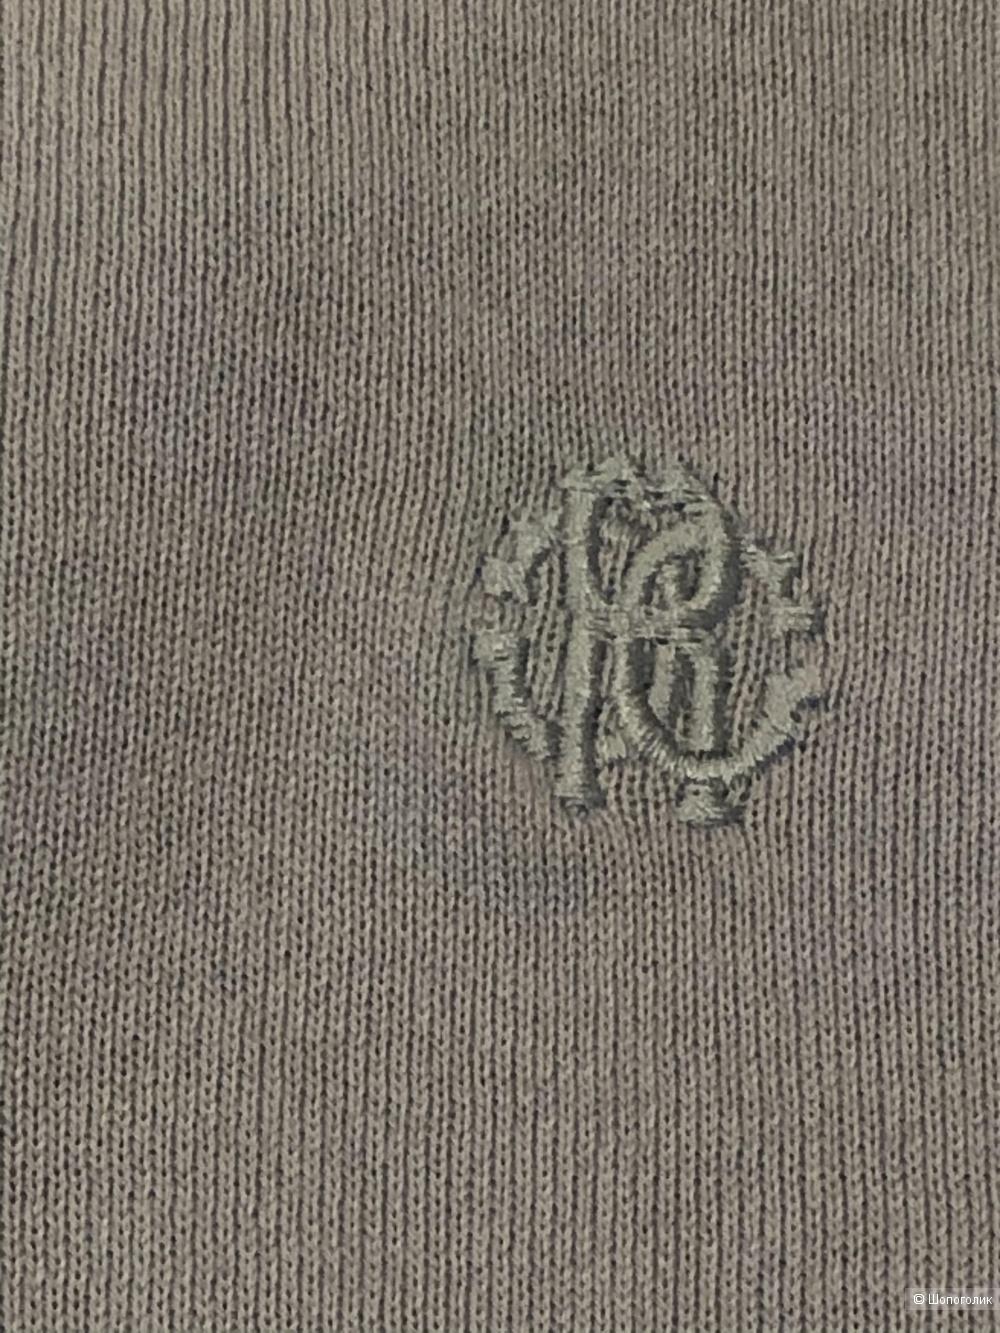 Мужское поло-свитер ROBERTO CAVALLI р. L